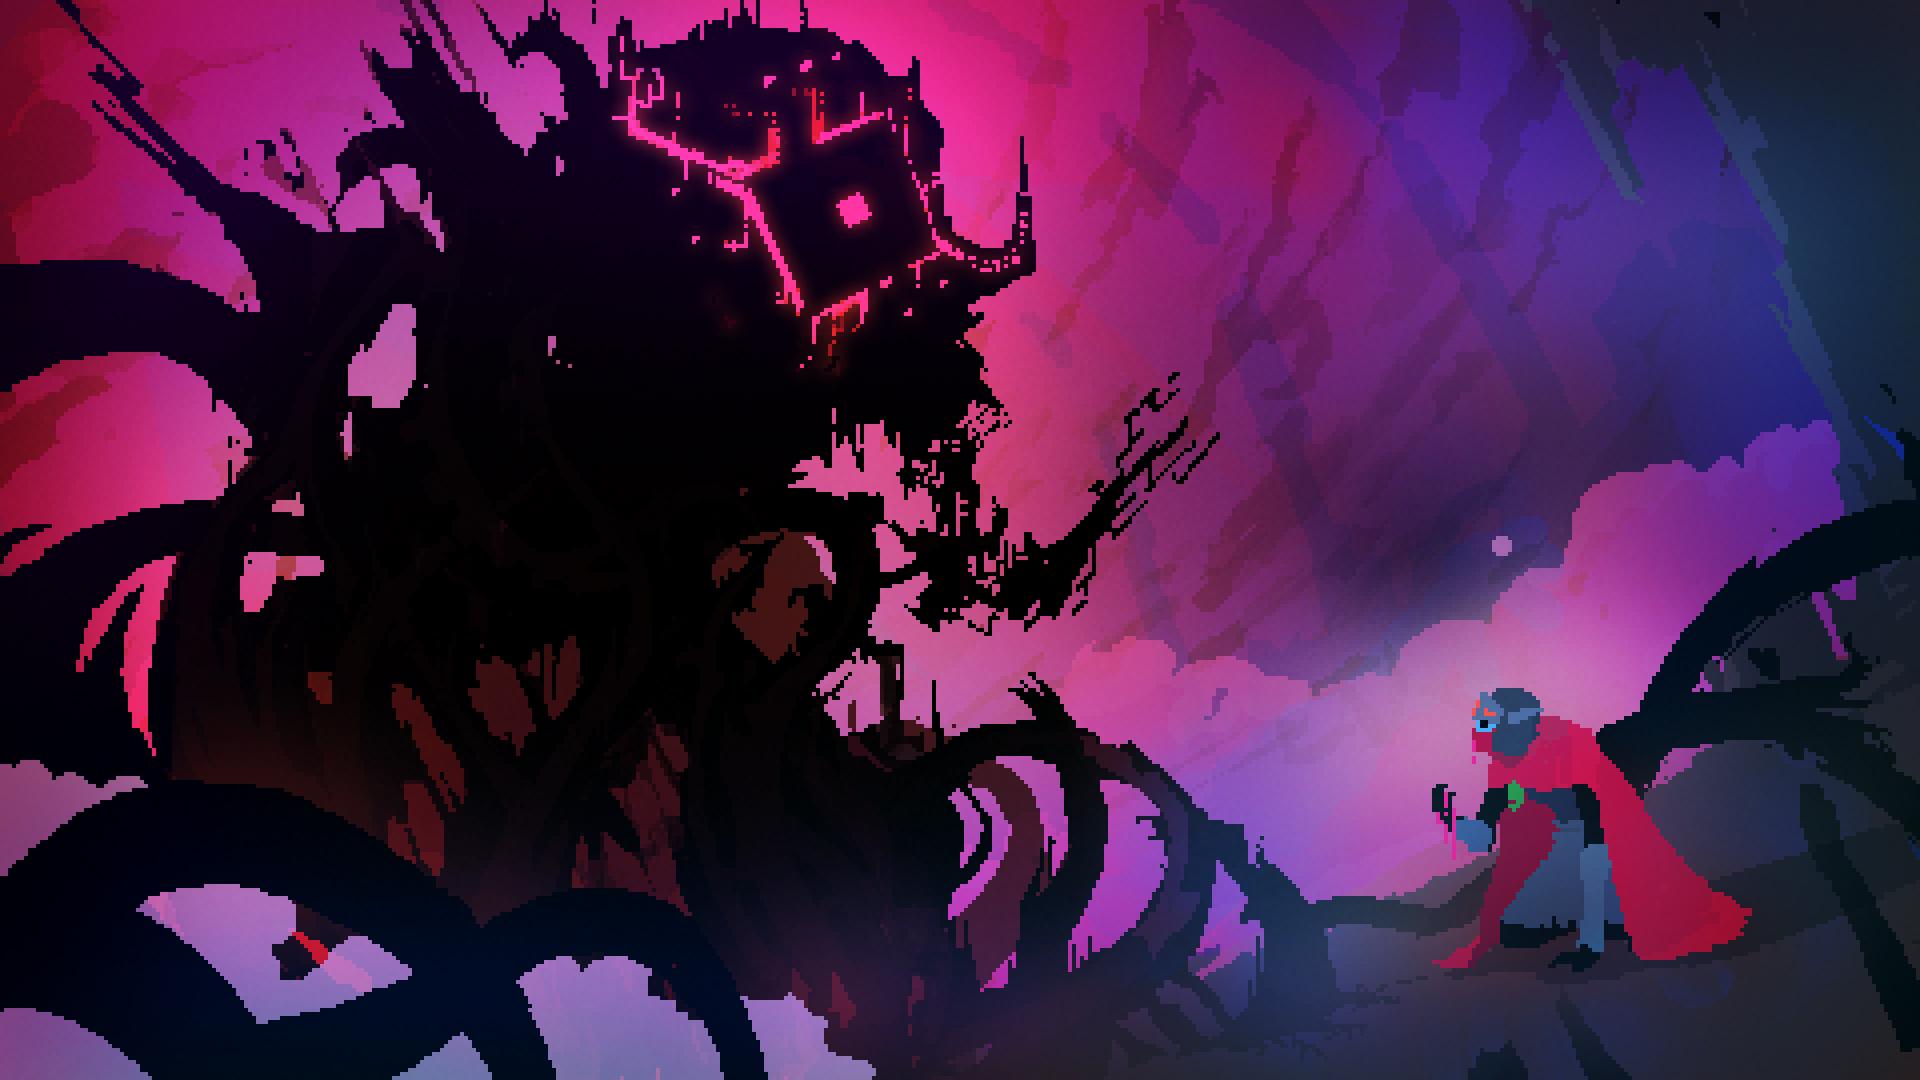 Inspired By Zelda: The Beautiful Violence Of Hyper Light Drifter